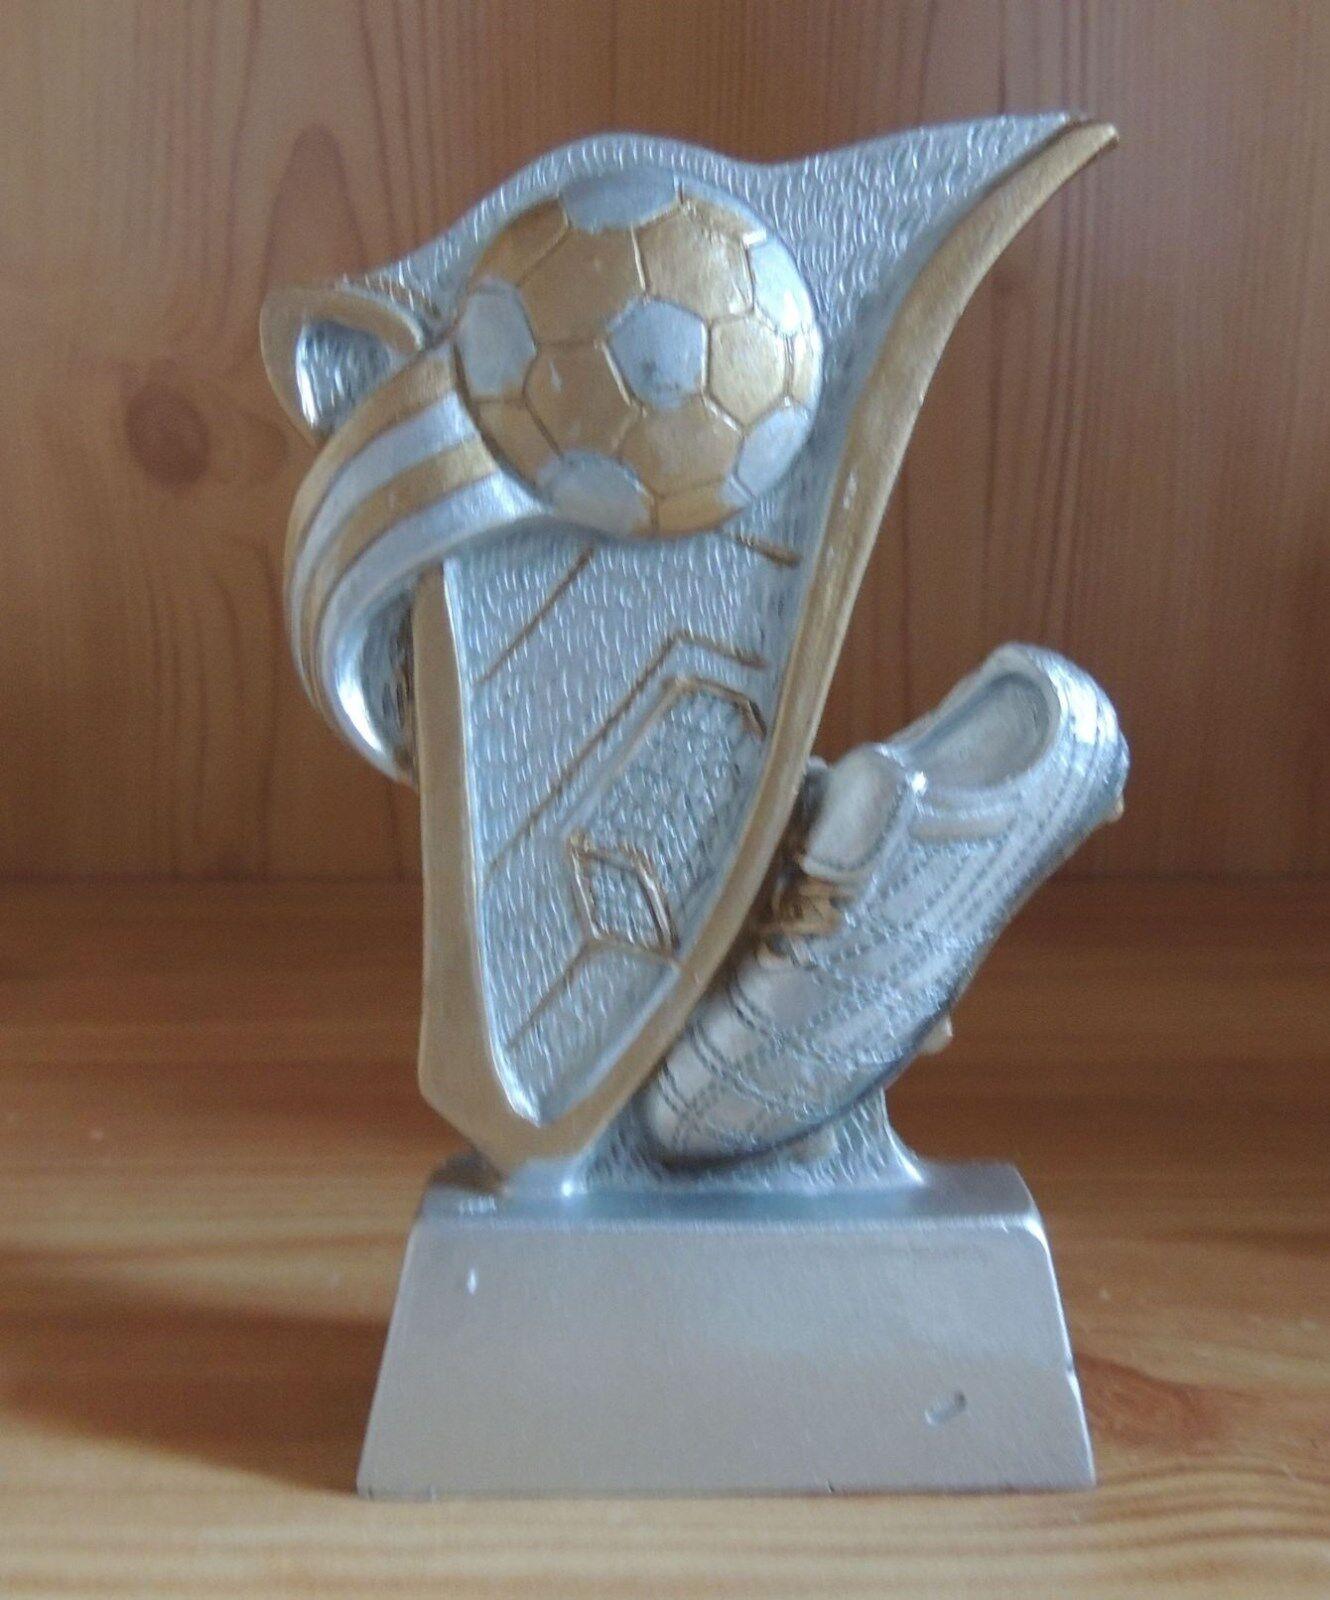 12 Figuren Figuren Figuren Fußball Fußball Schuh + Ball 15cm  FB181(Pokal Pokale Gravur Turnier) bab37b